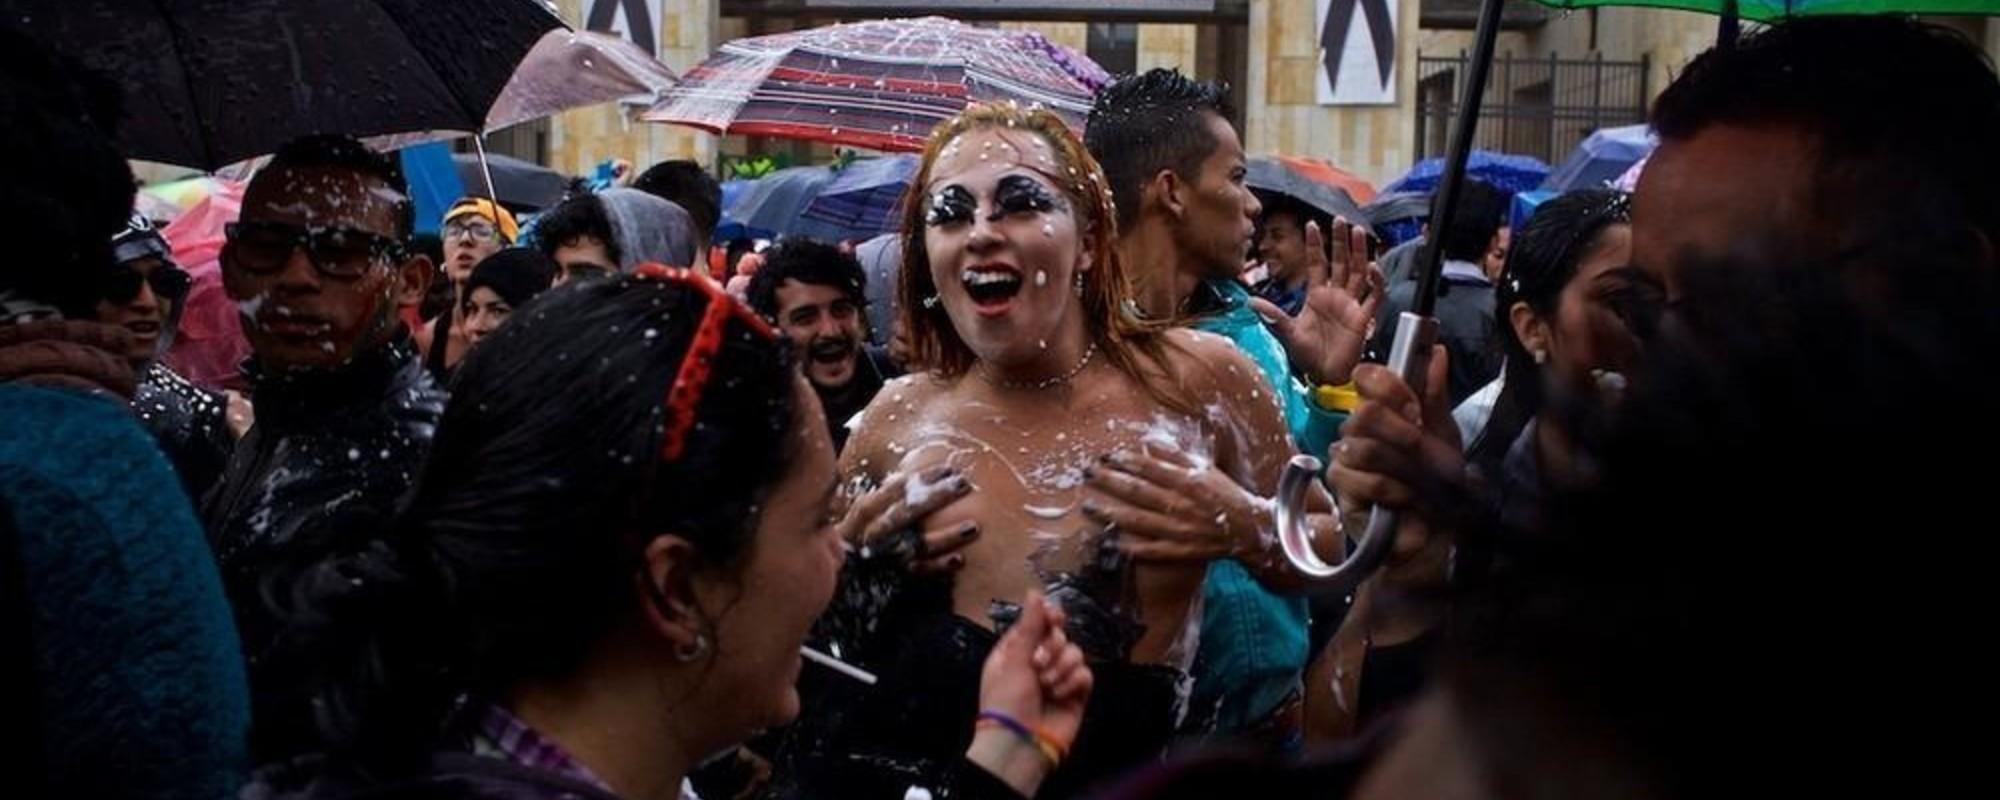 Fotos de la marcha del orgullo LGBT en Bogotá